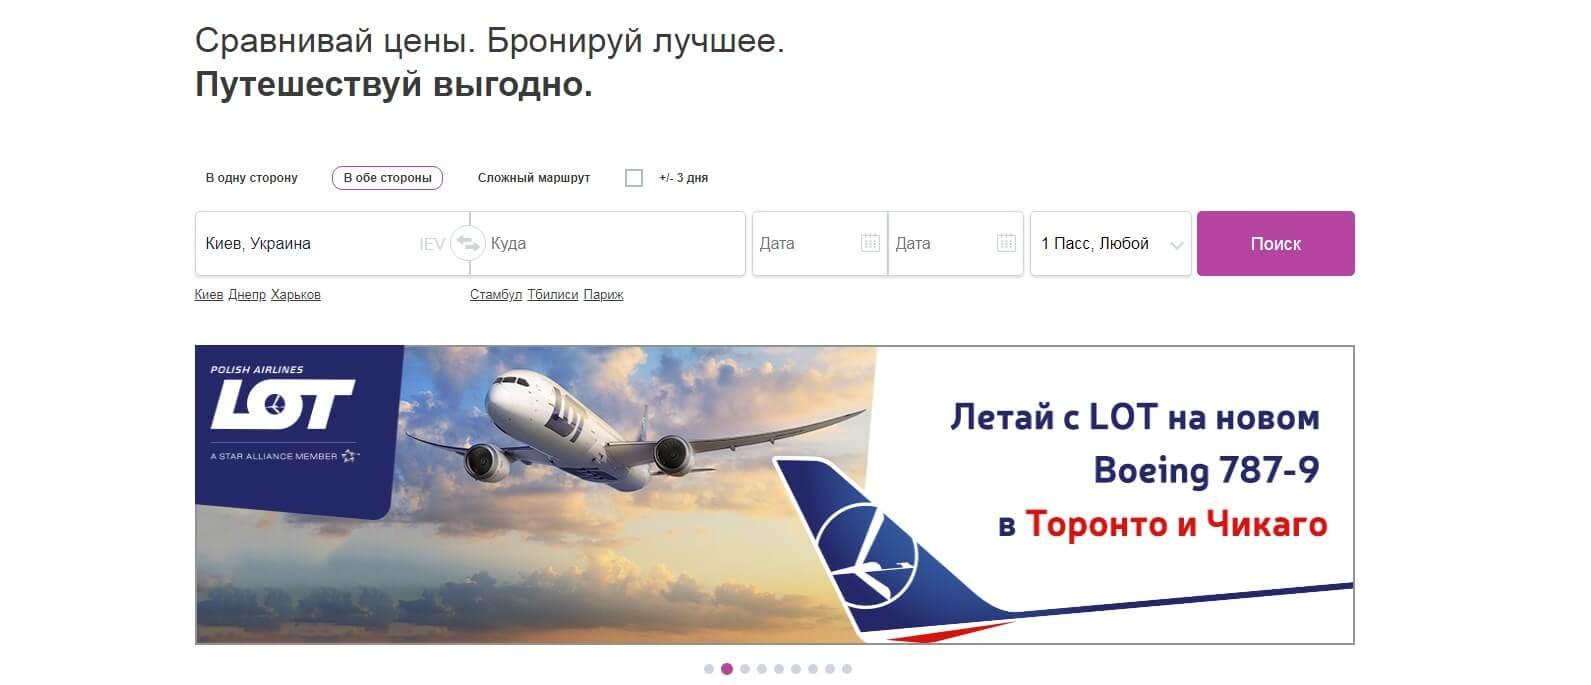 Як придбати квитки на Тікетс.Юей? Авіаквитки на tikets.ua онлайн